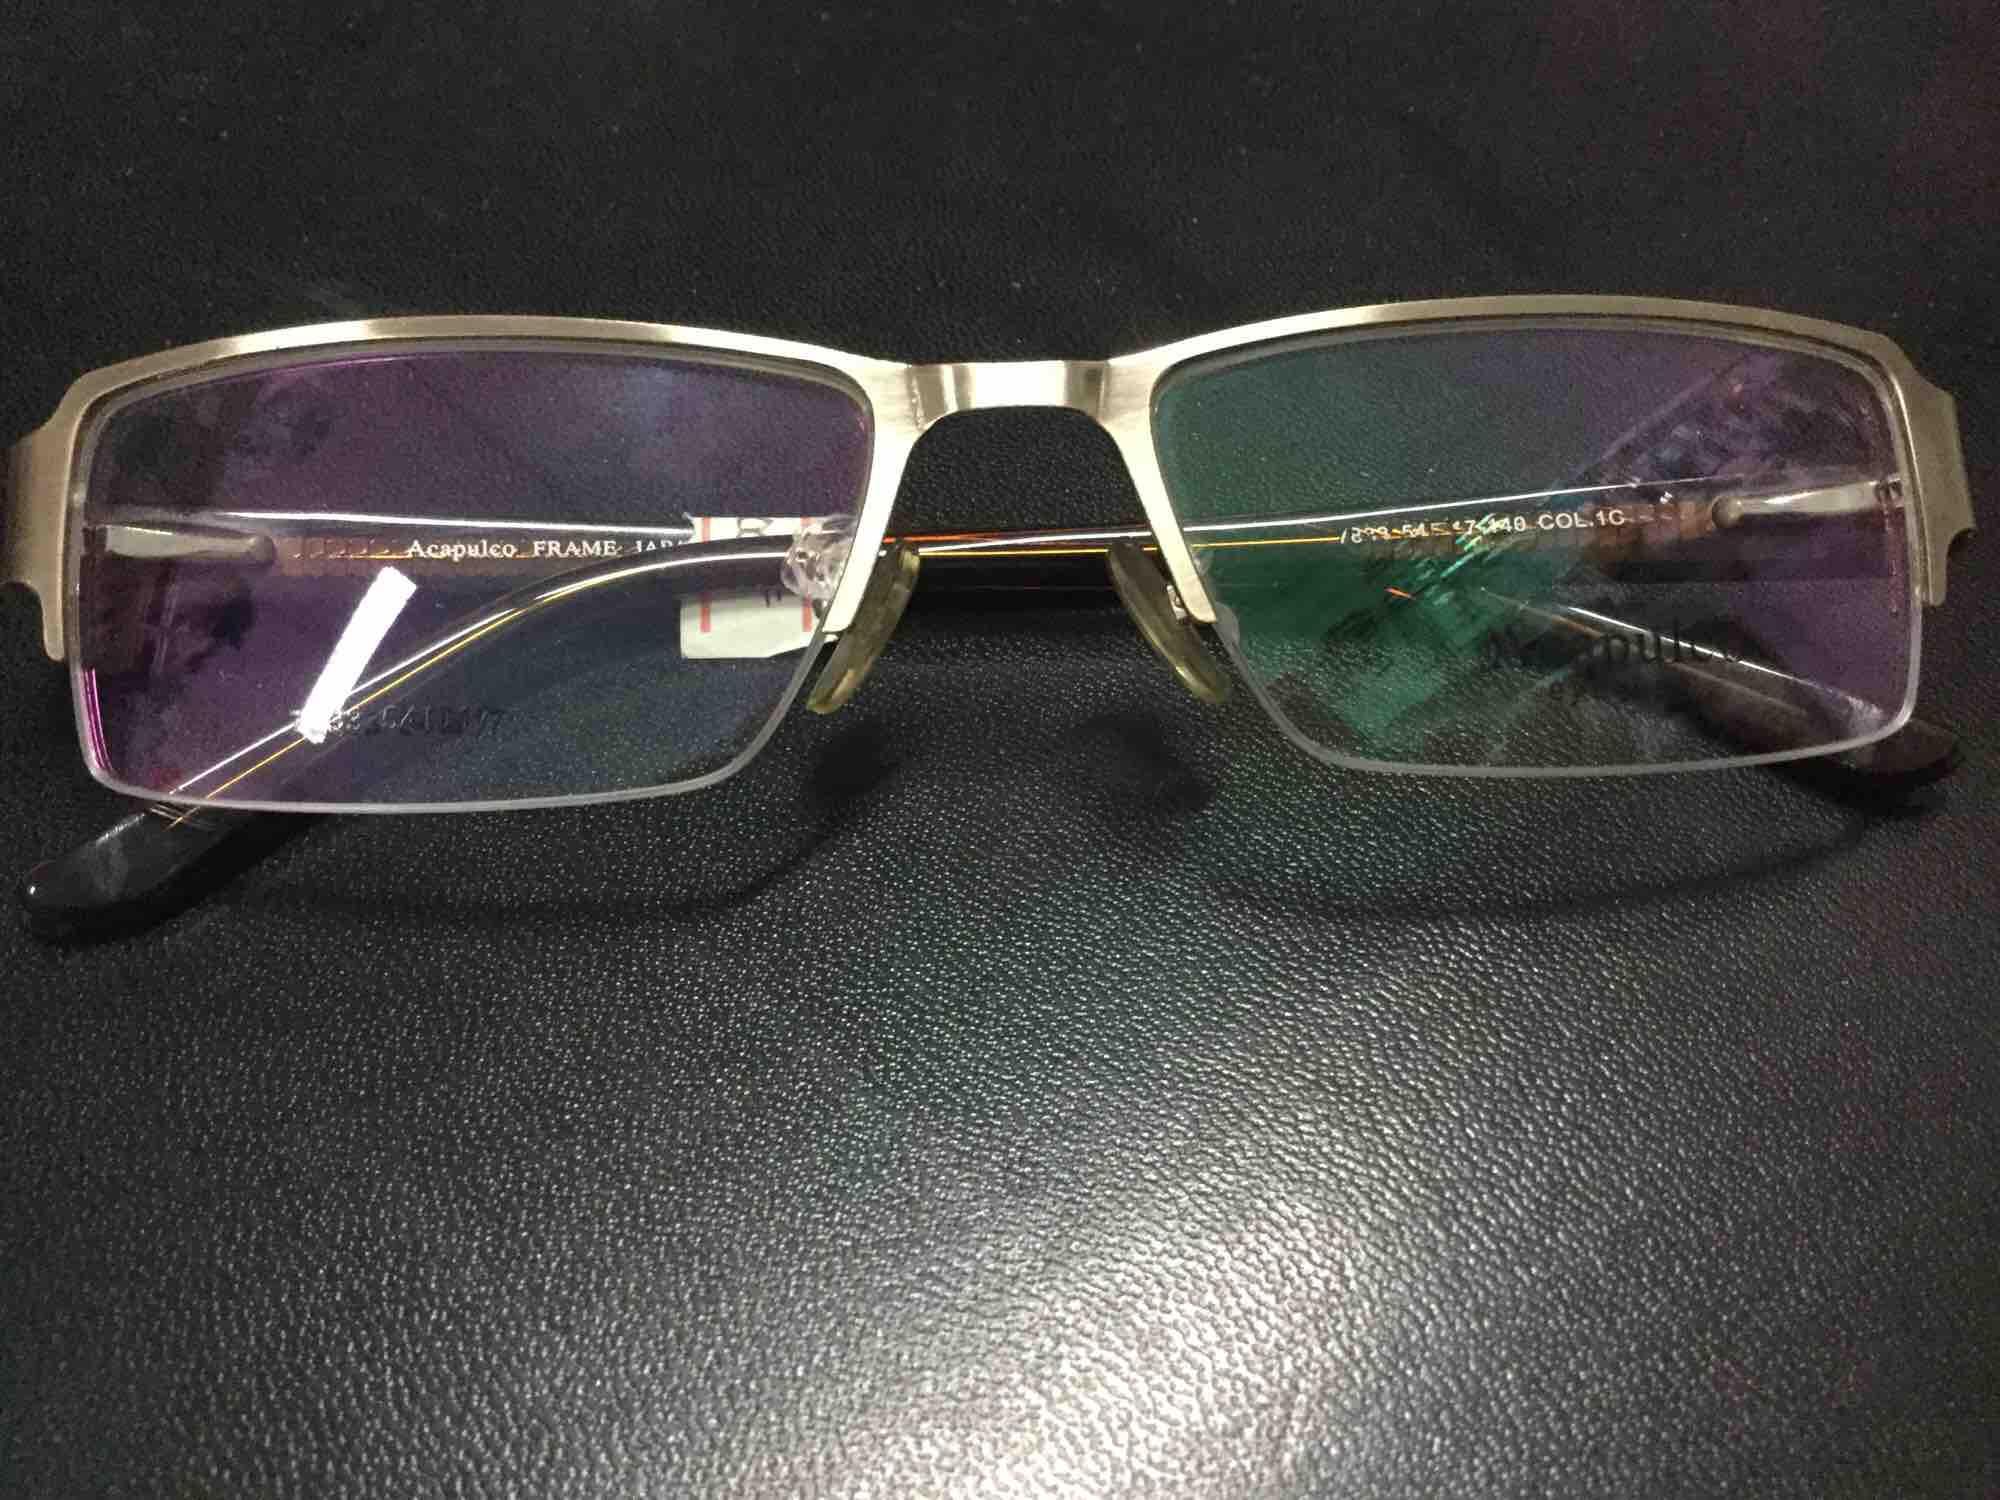 Mens Prescription Glasses for sale - Prescription Glasses for Men ... b6dcd0efc2c0